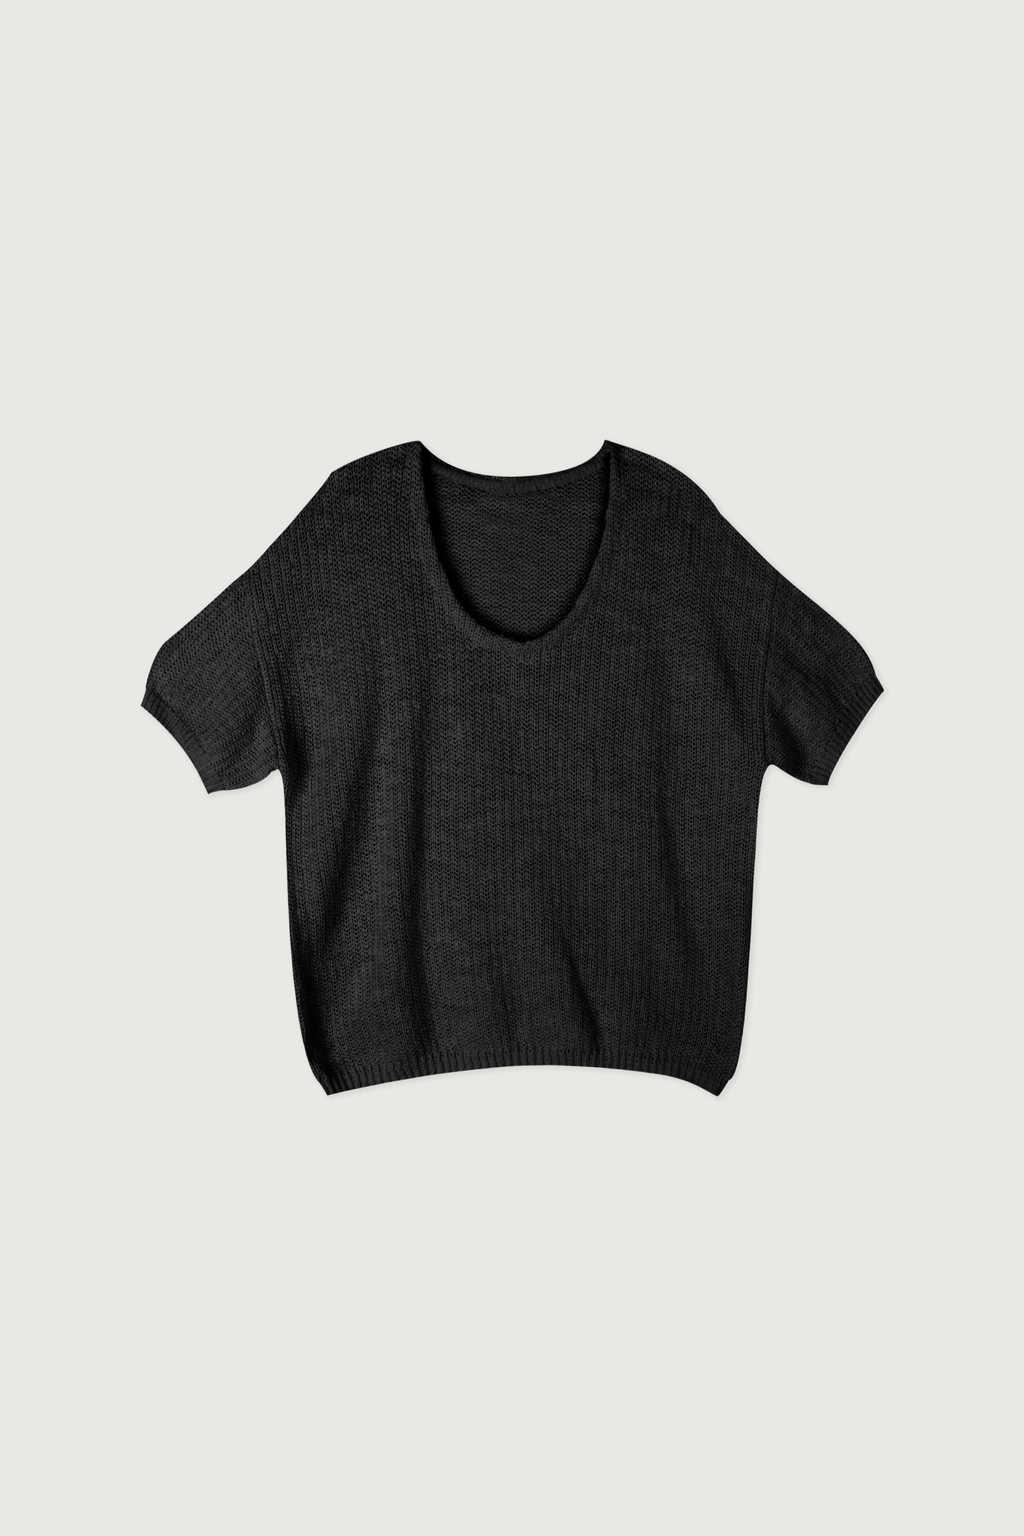 Sweater 3247 Black 8